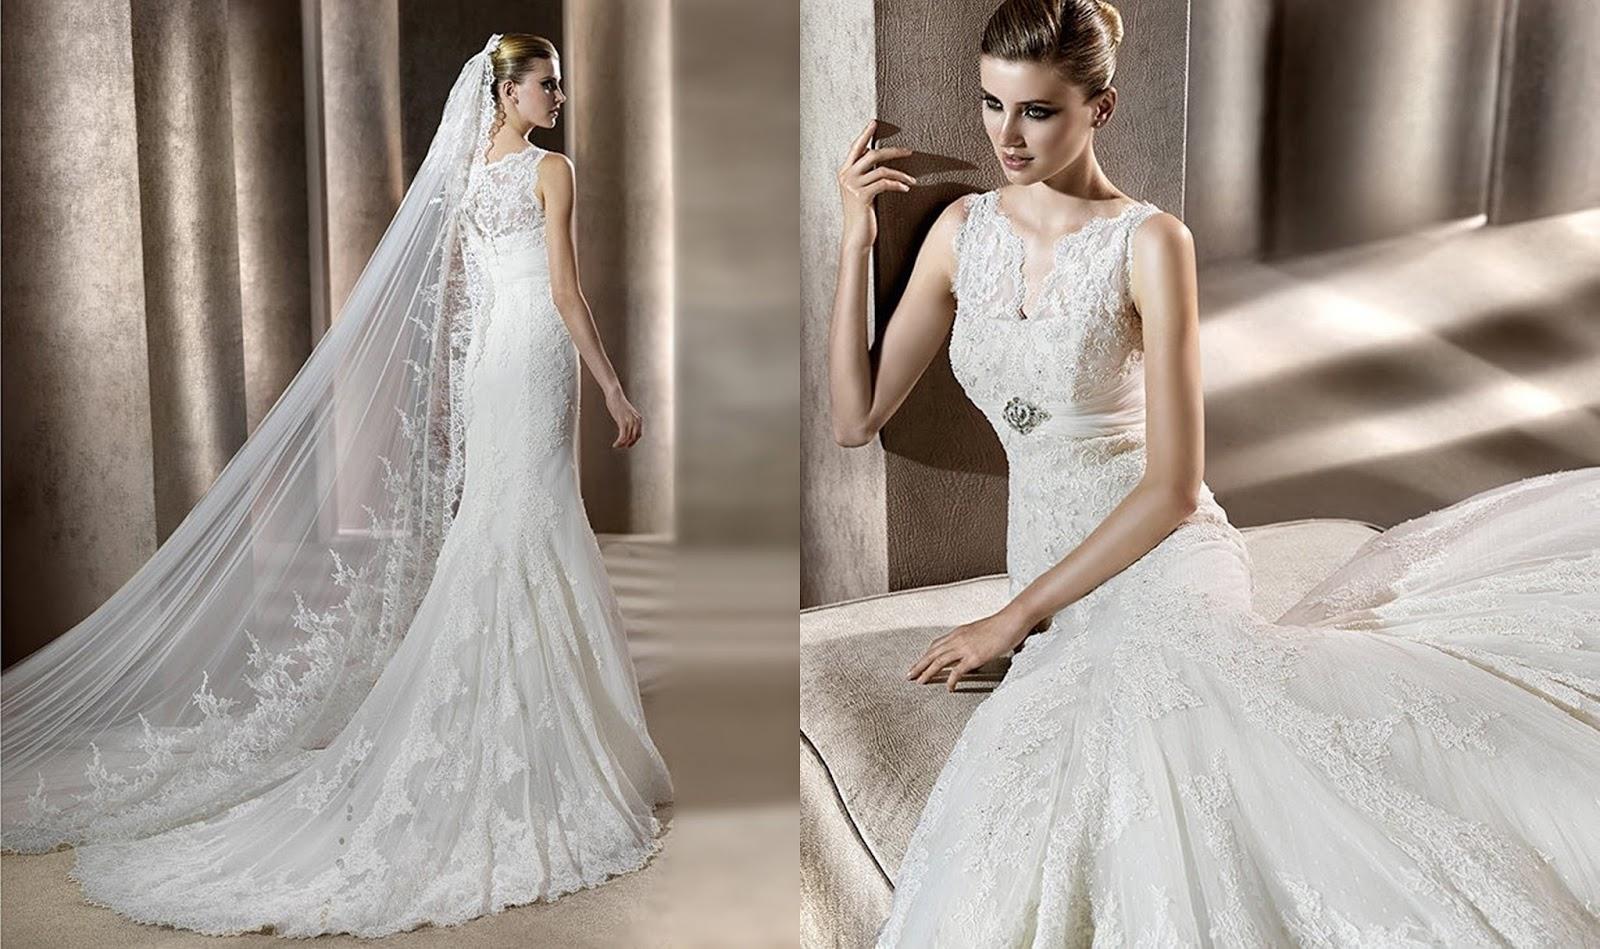 landybridal vintage lace wedding tank top wedding dresses Luxurious Trumpet Mermaid Tank Top Brush Train Ivory Wedding Dress